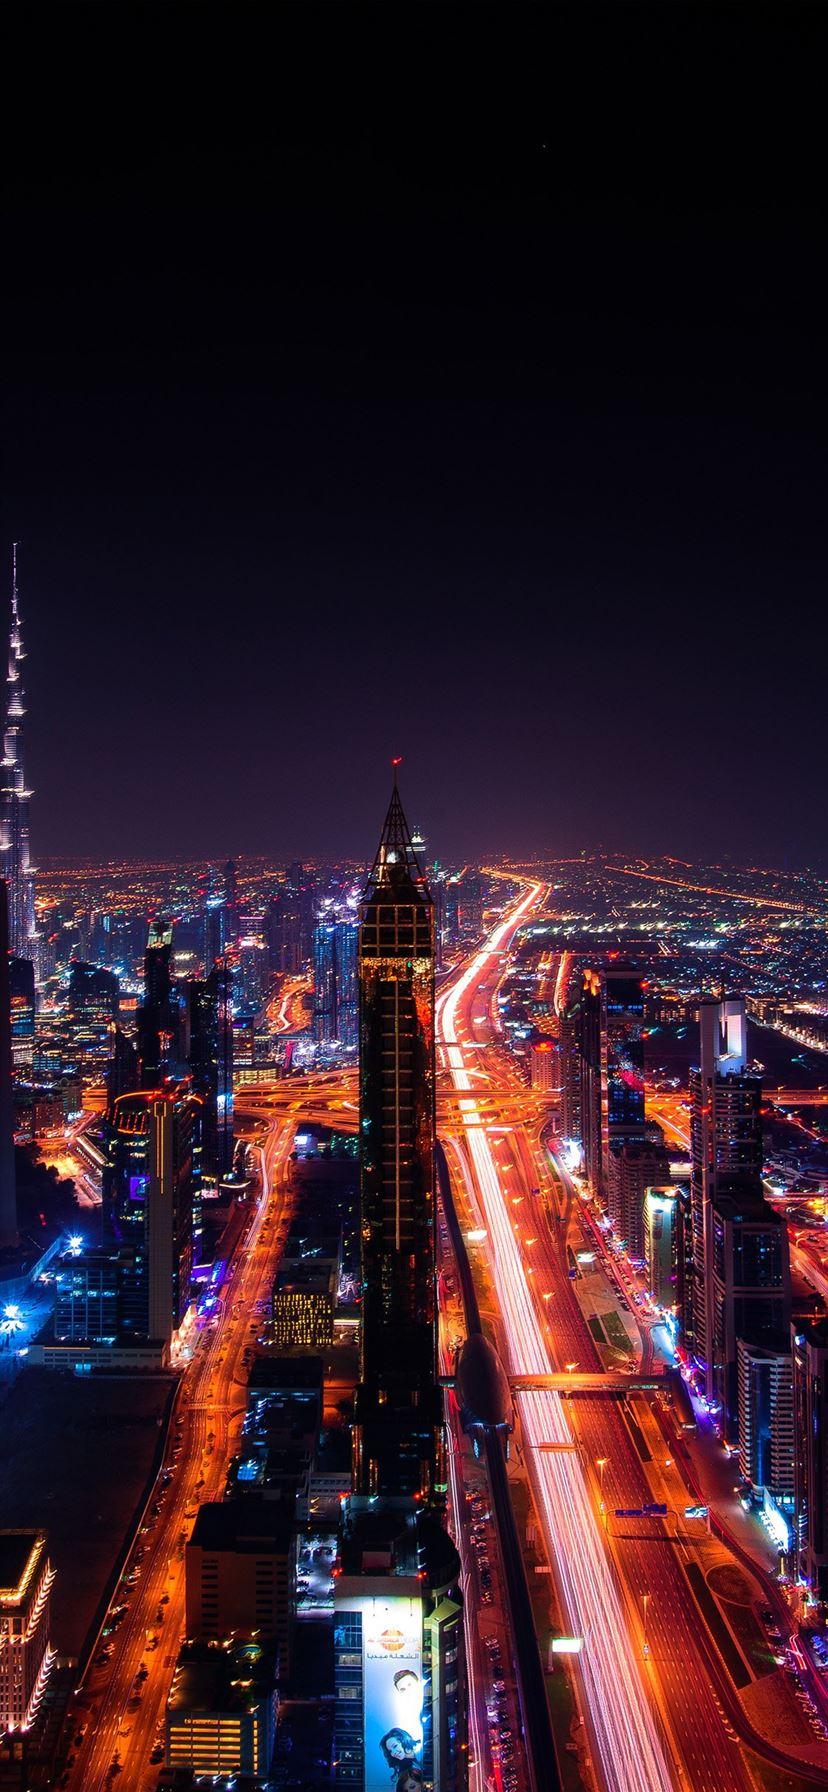 City night light car dark iPhone 11 Wallpapers Free Download